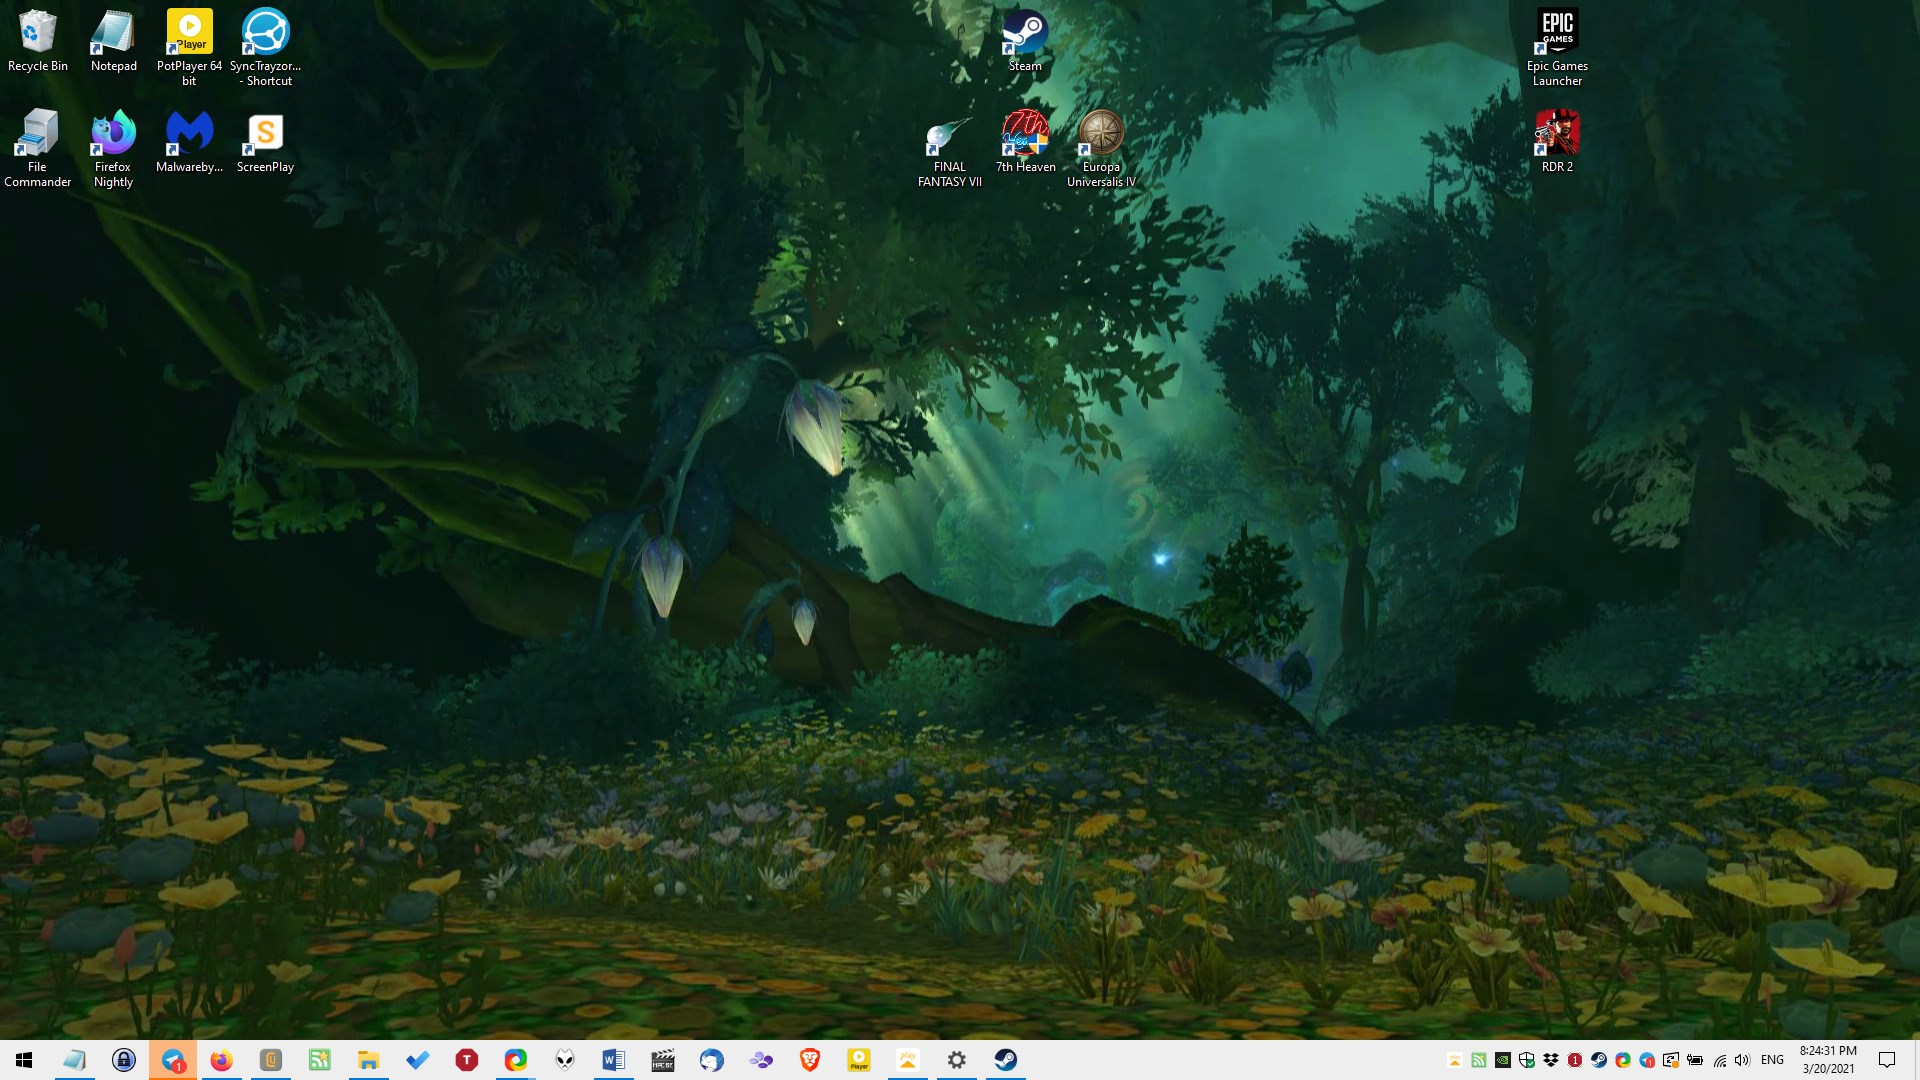 ScreenPlay desktopwallpaper